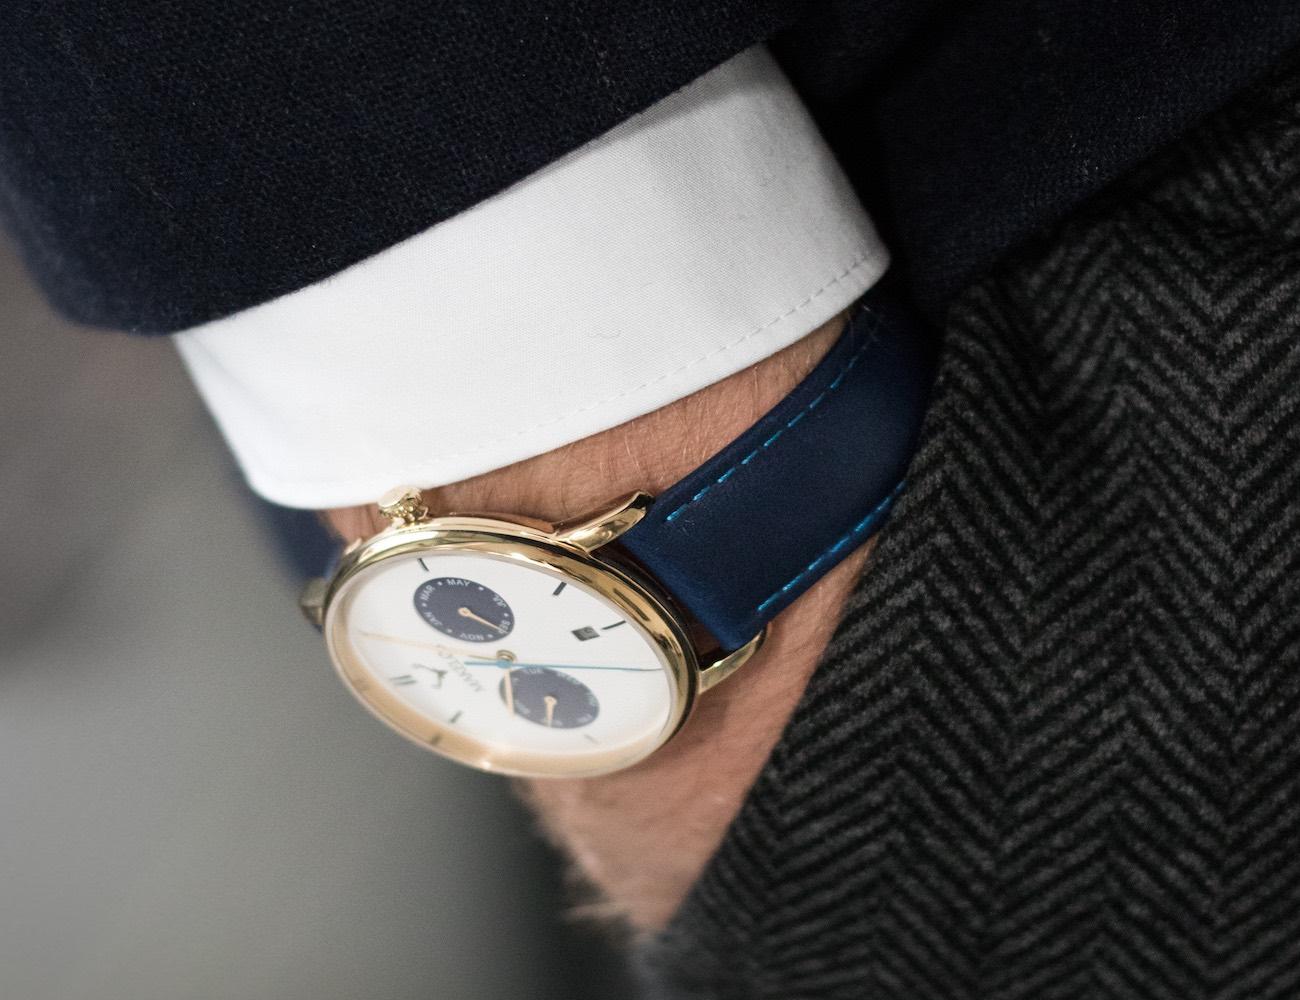 MAKELOS Dandyline Automatic Watches